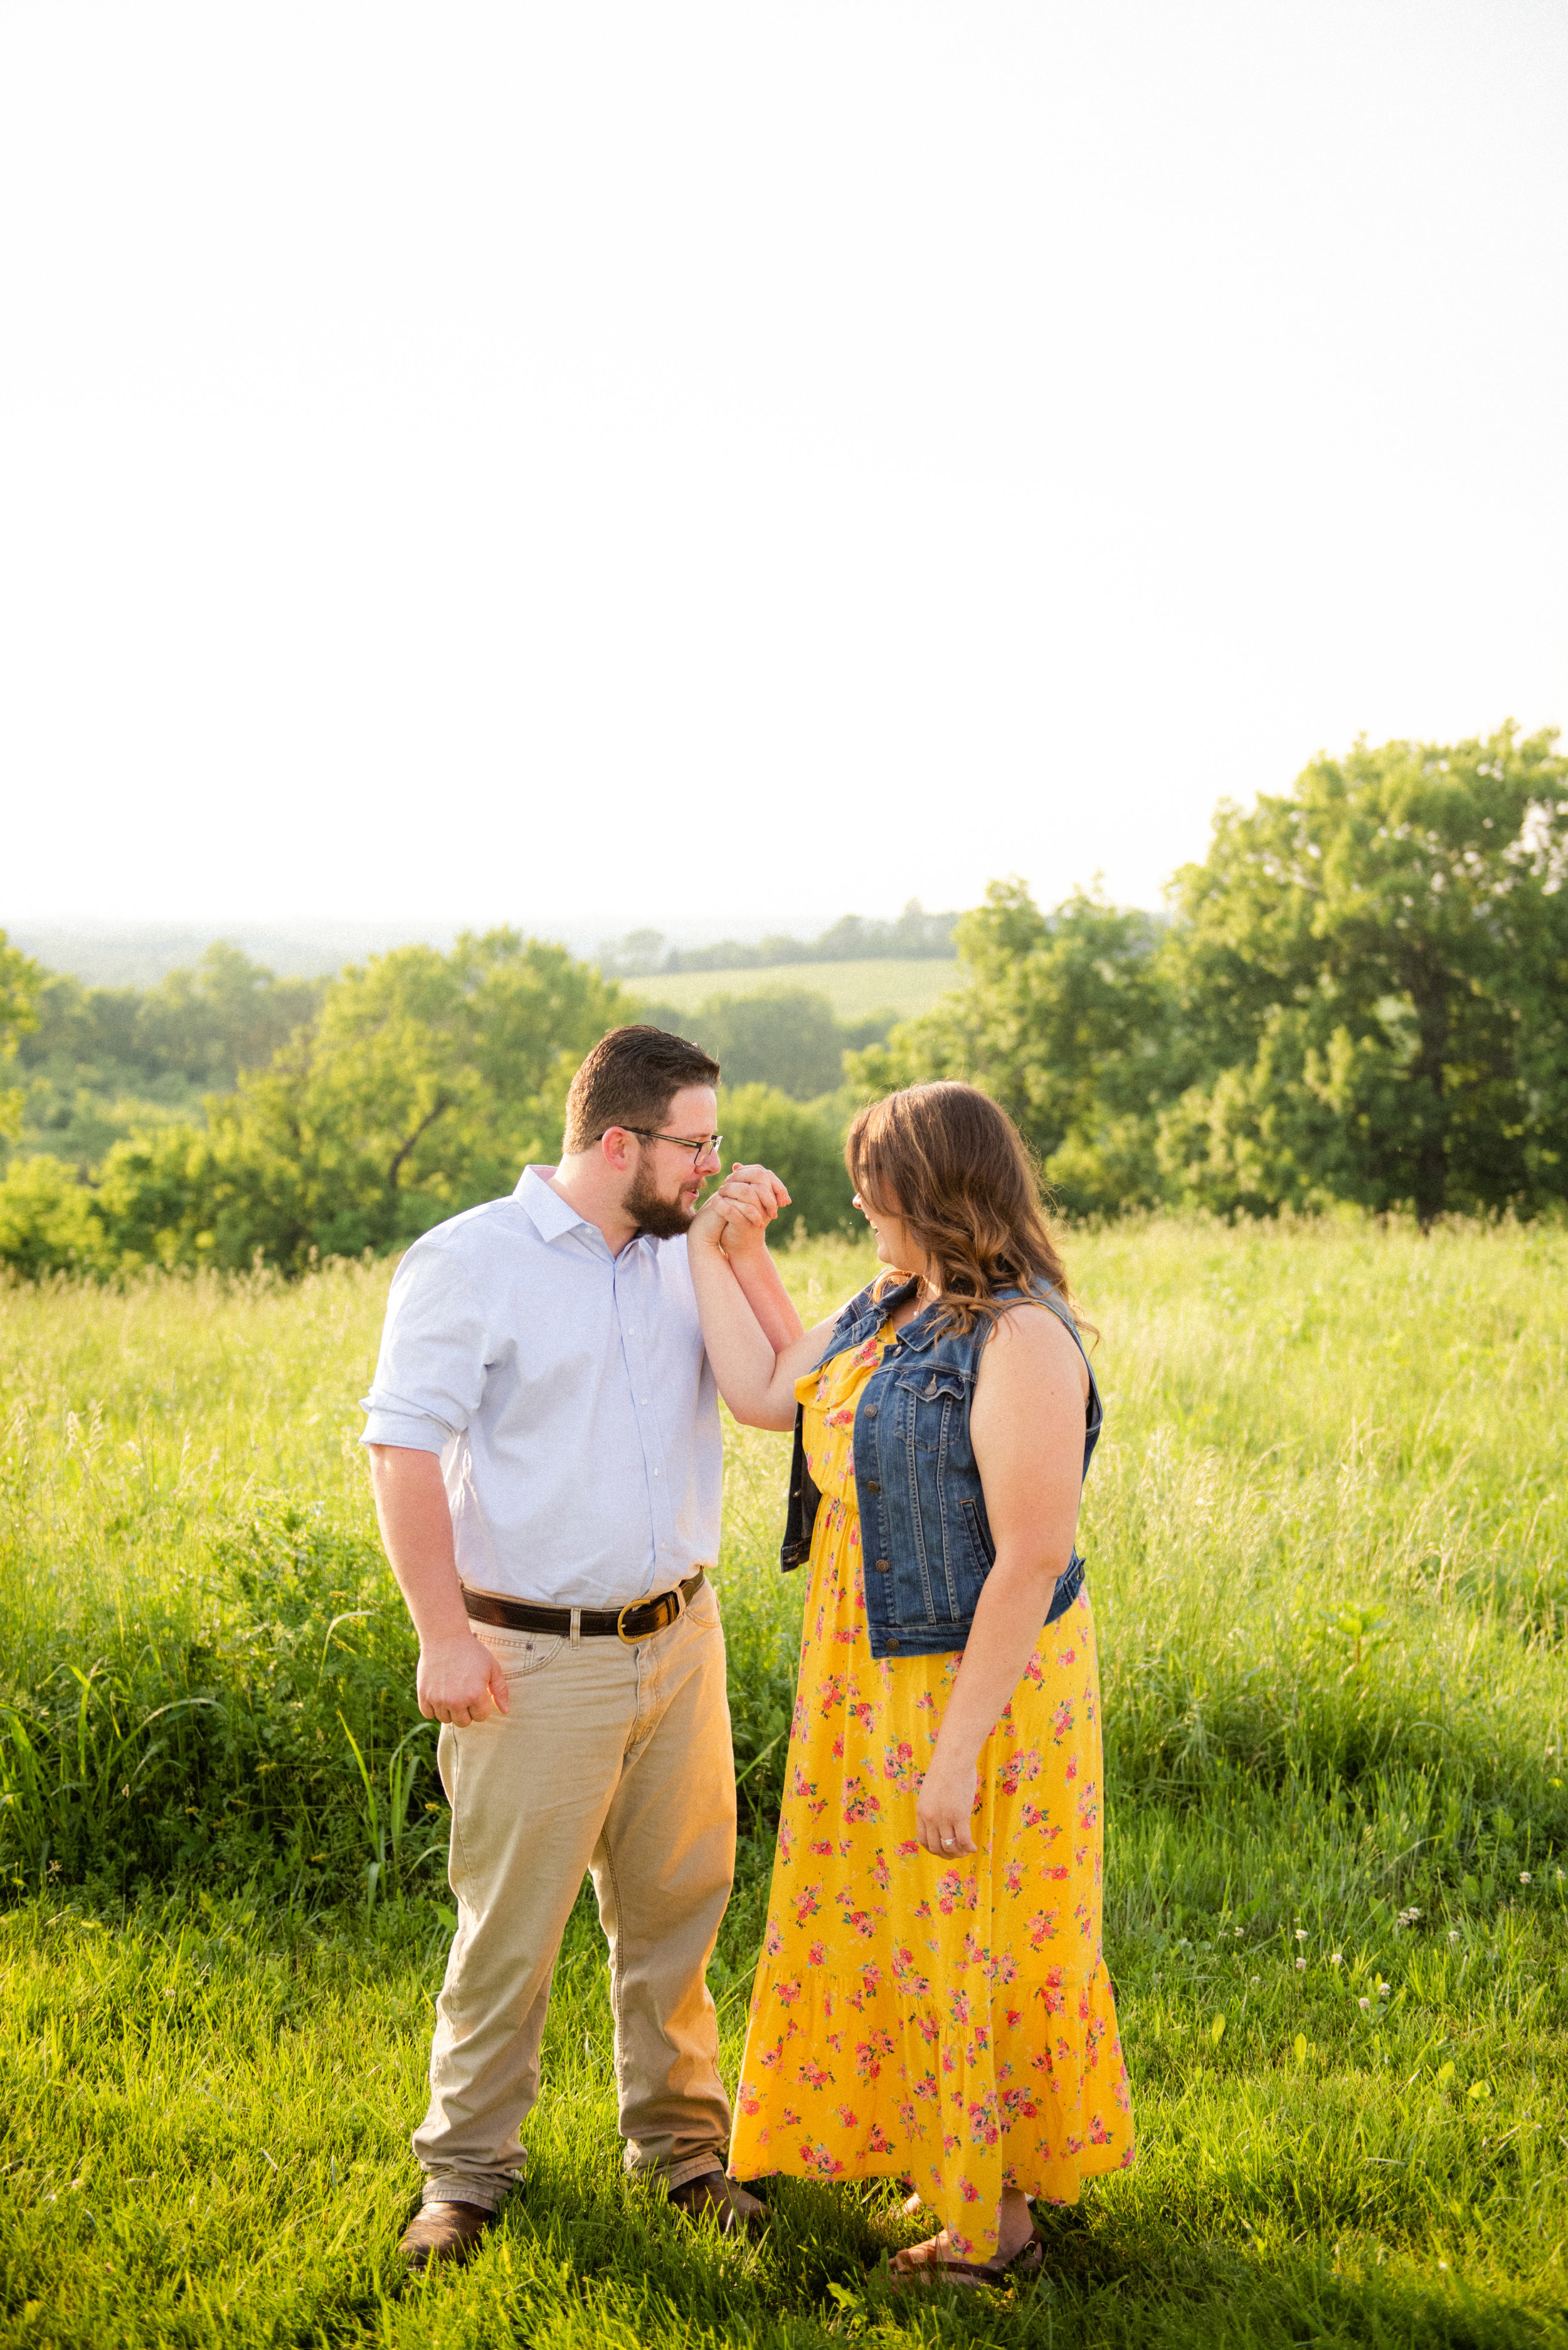 Makayla&Austin-EngagementSession-28.jpg